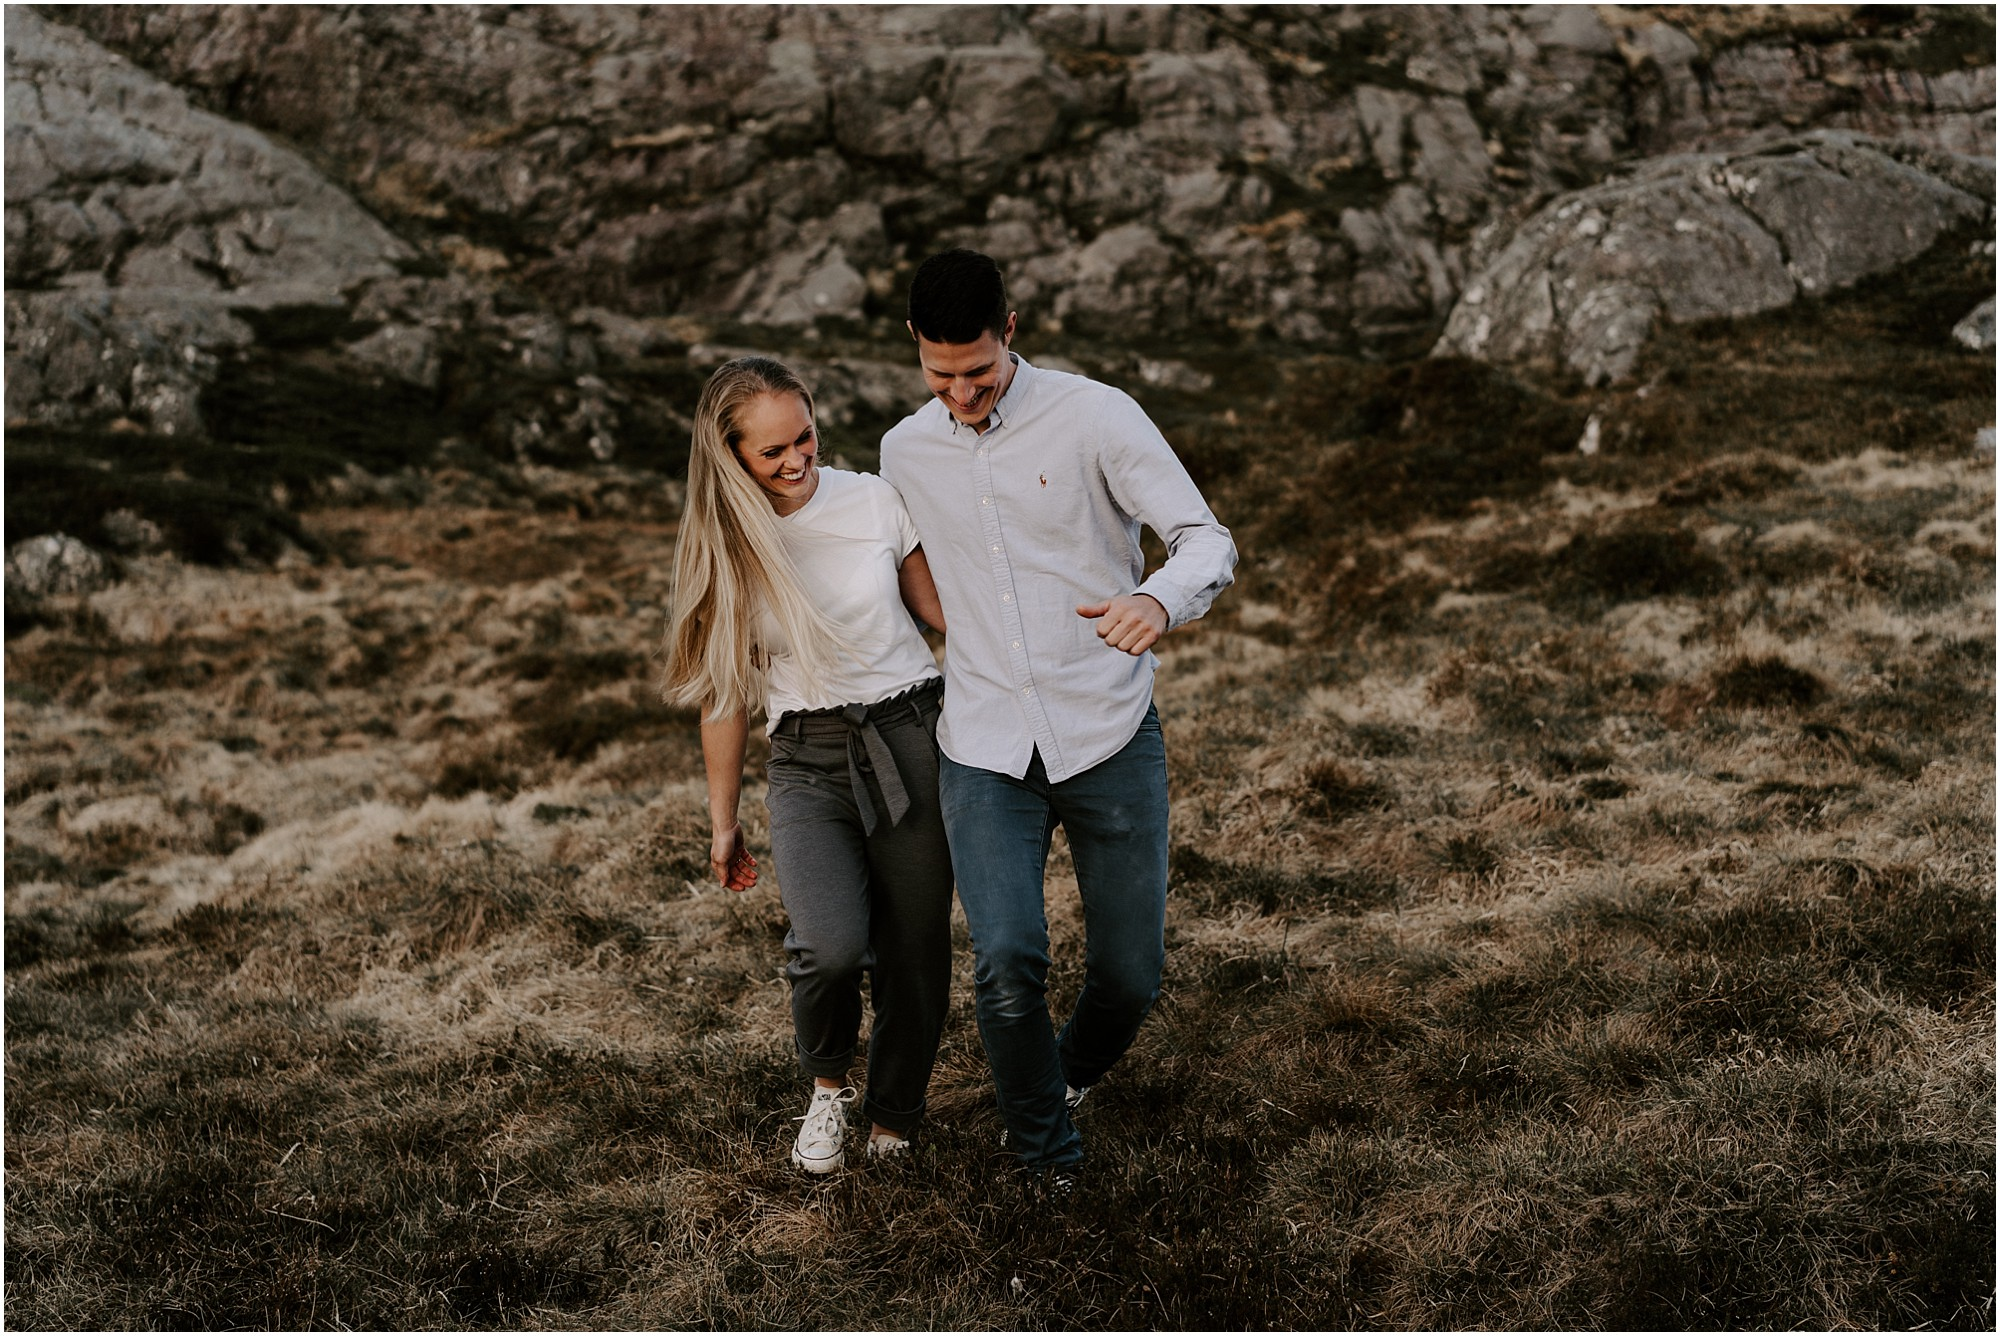 norway-engagement-session-destination-elopement-photographer_0005.jpg